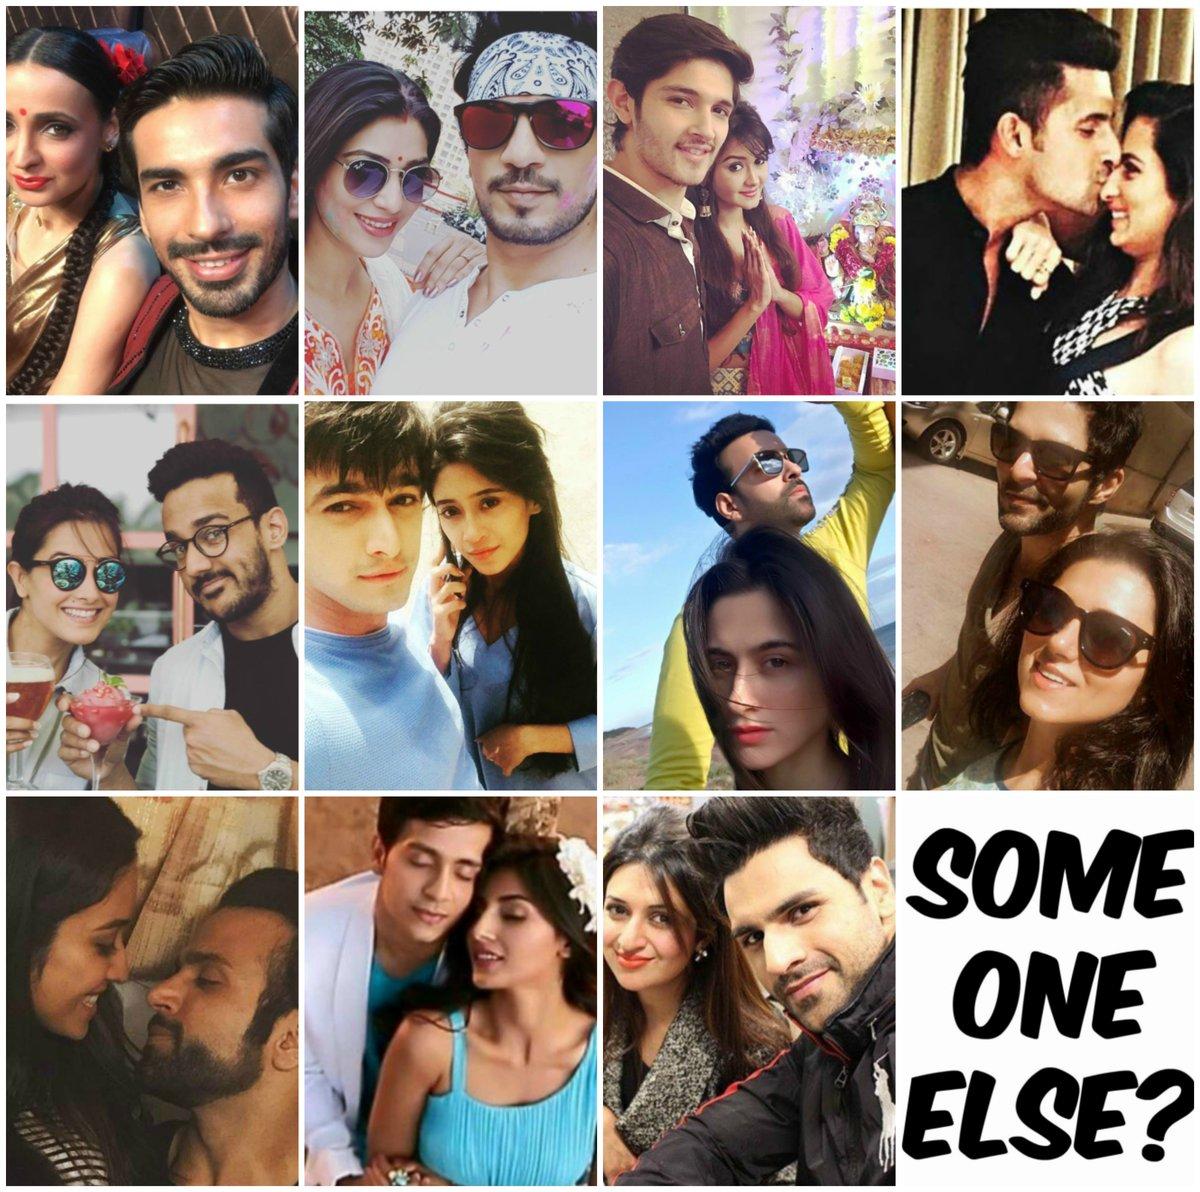 Your favourite Telly couple is?!  #Monaya #ArjunNeha #RoKa #SaRavi #AnitaRohit #ShivIn #SanAm #RaqeshRidhi #Ashvik #Parsh #Divek Someone else?  RT & Reply using #TTIMyFavouriteCoupleIspic.twitter.com/AXr9CNPcAV